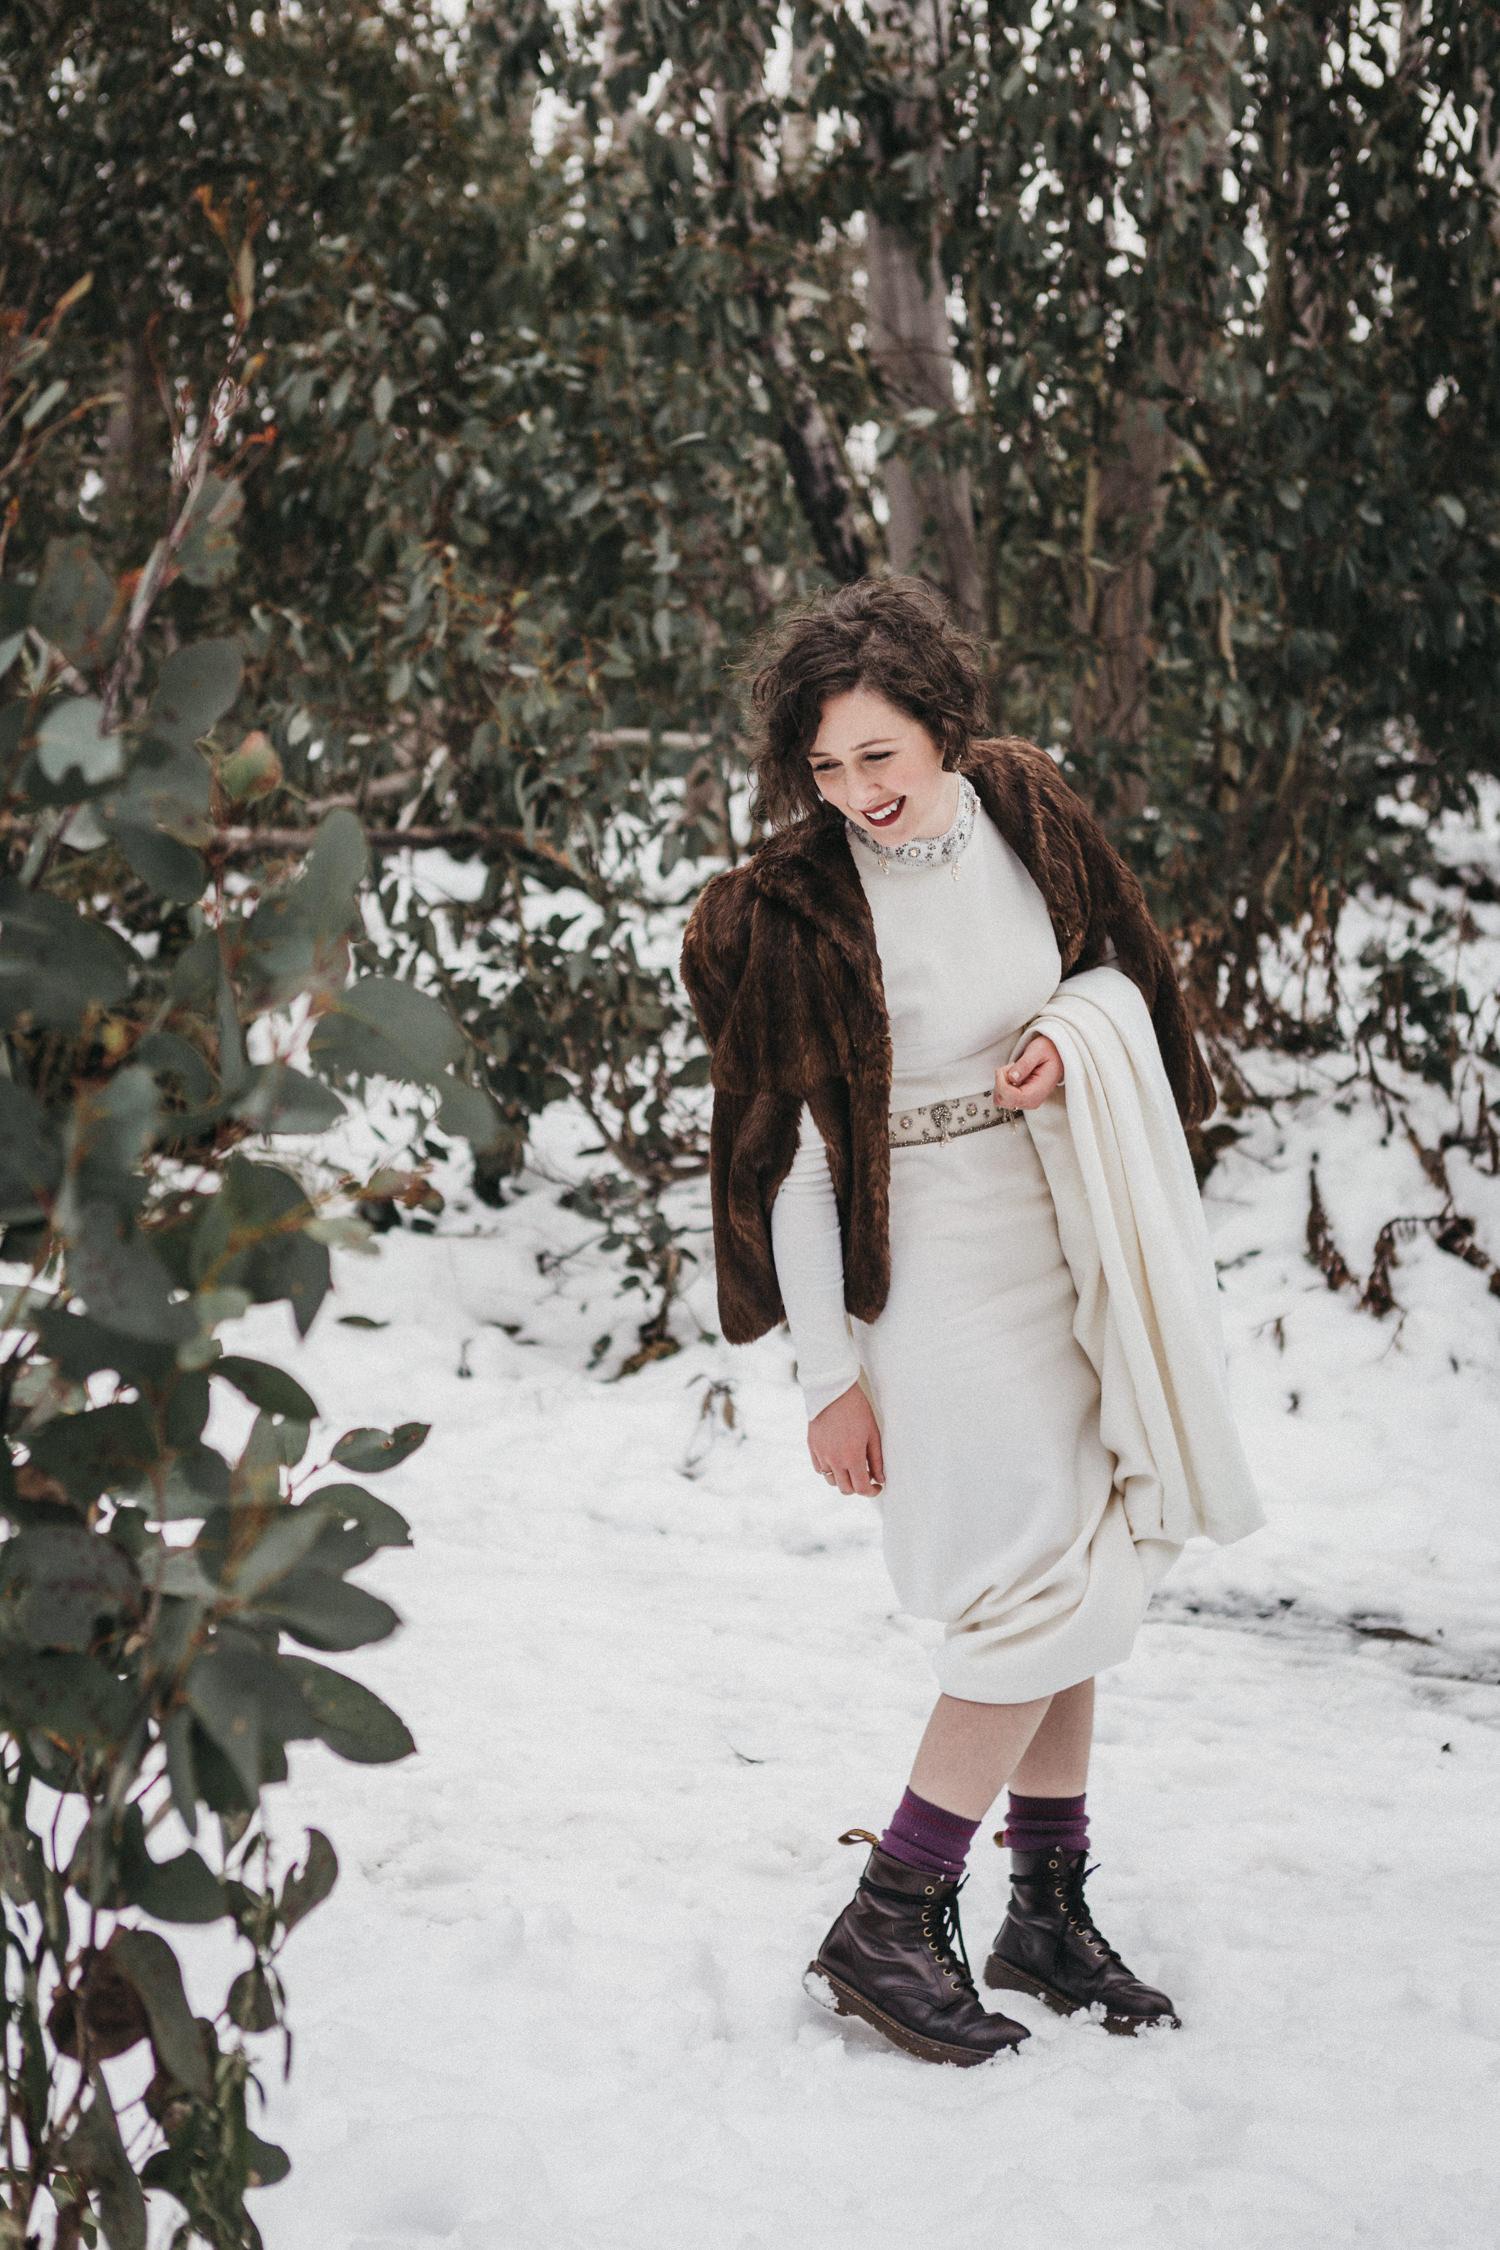 Winter_Elopement_Amie_Nick_Anna_Taylor_189-766A1852.jpg